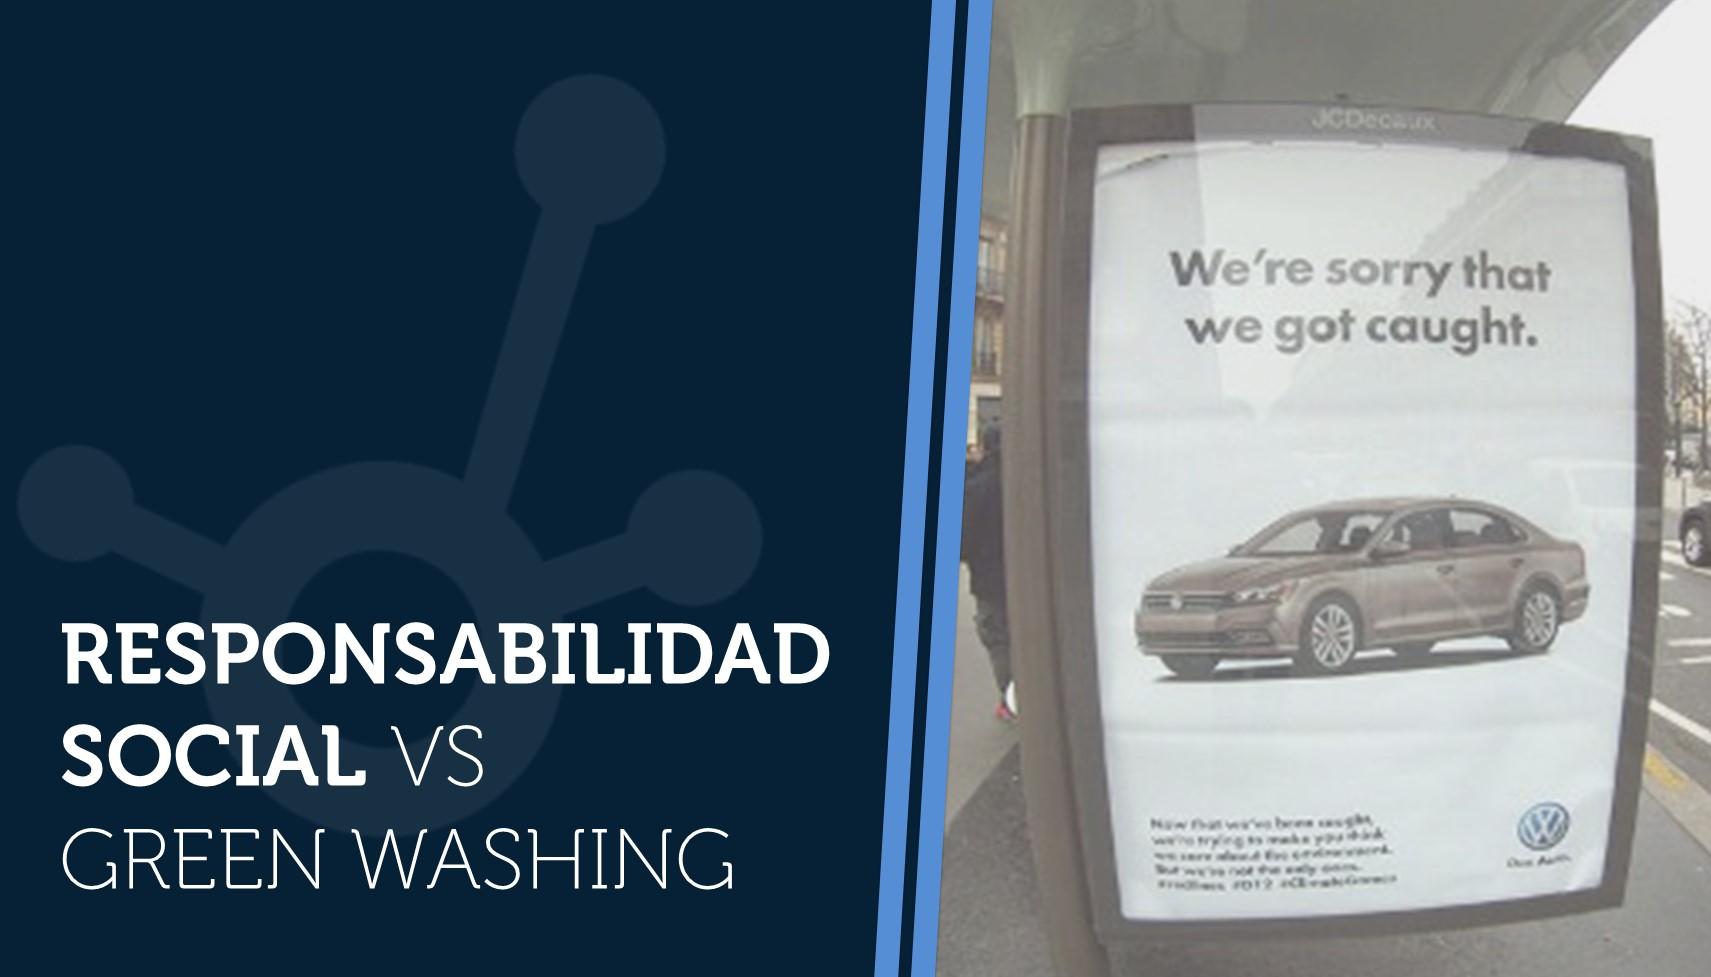 Responsabilidad Social vs Green Washing